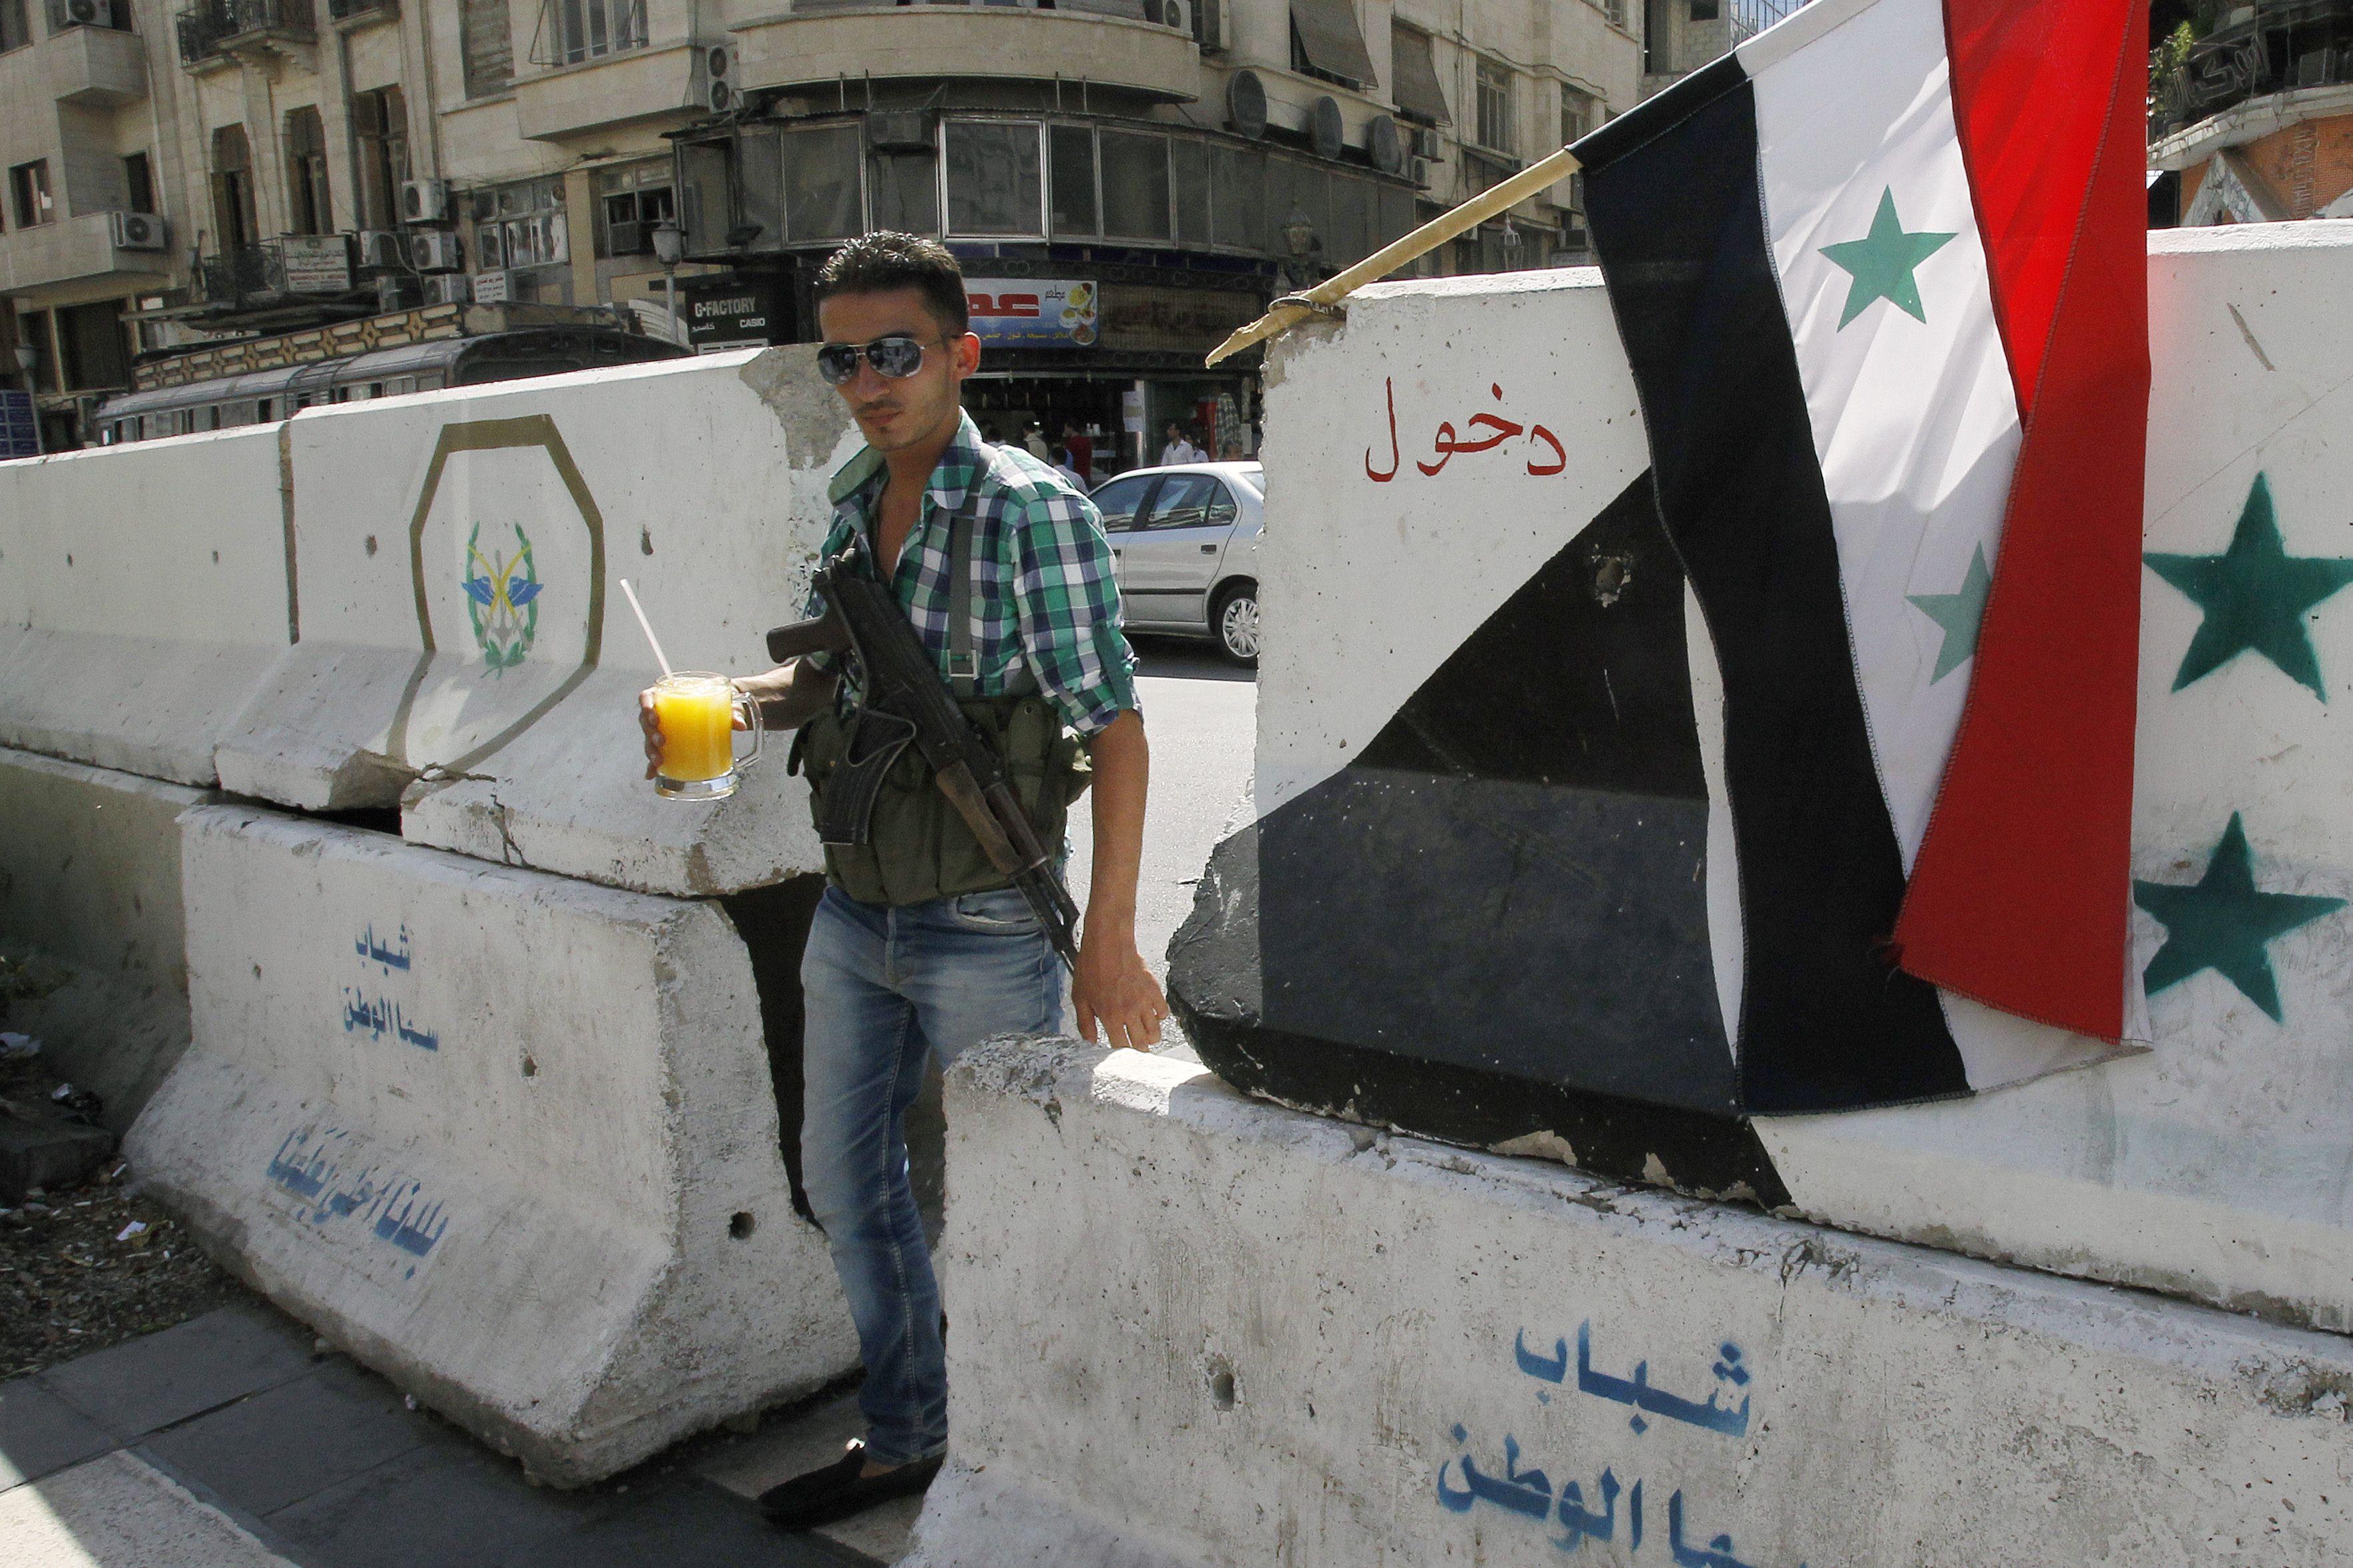 Natiunile Unite confirma utilizarea armelor chimice in Siria.